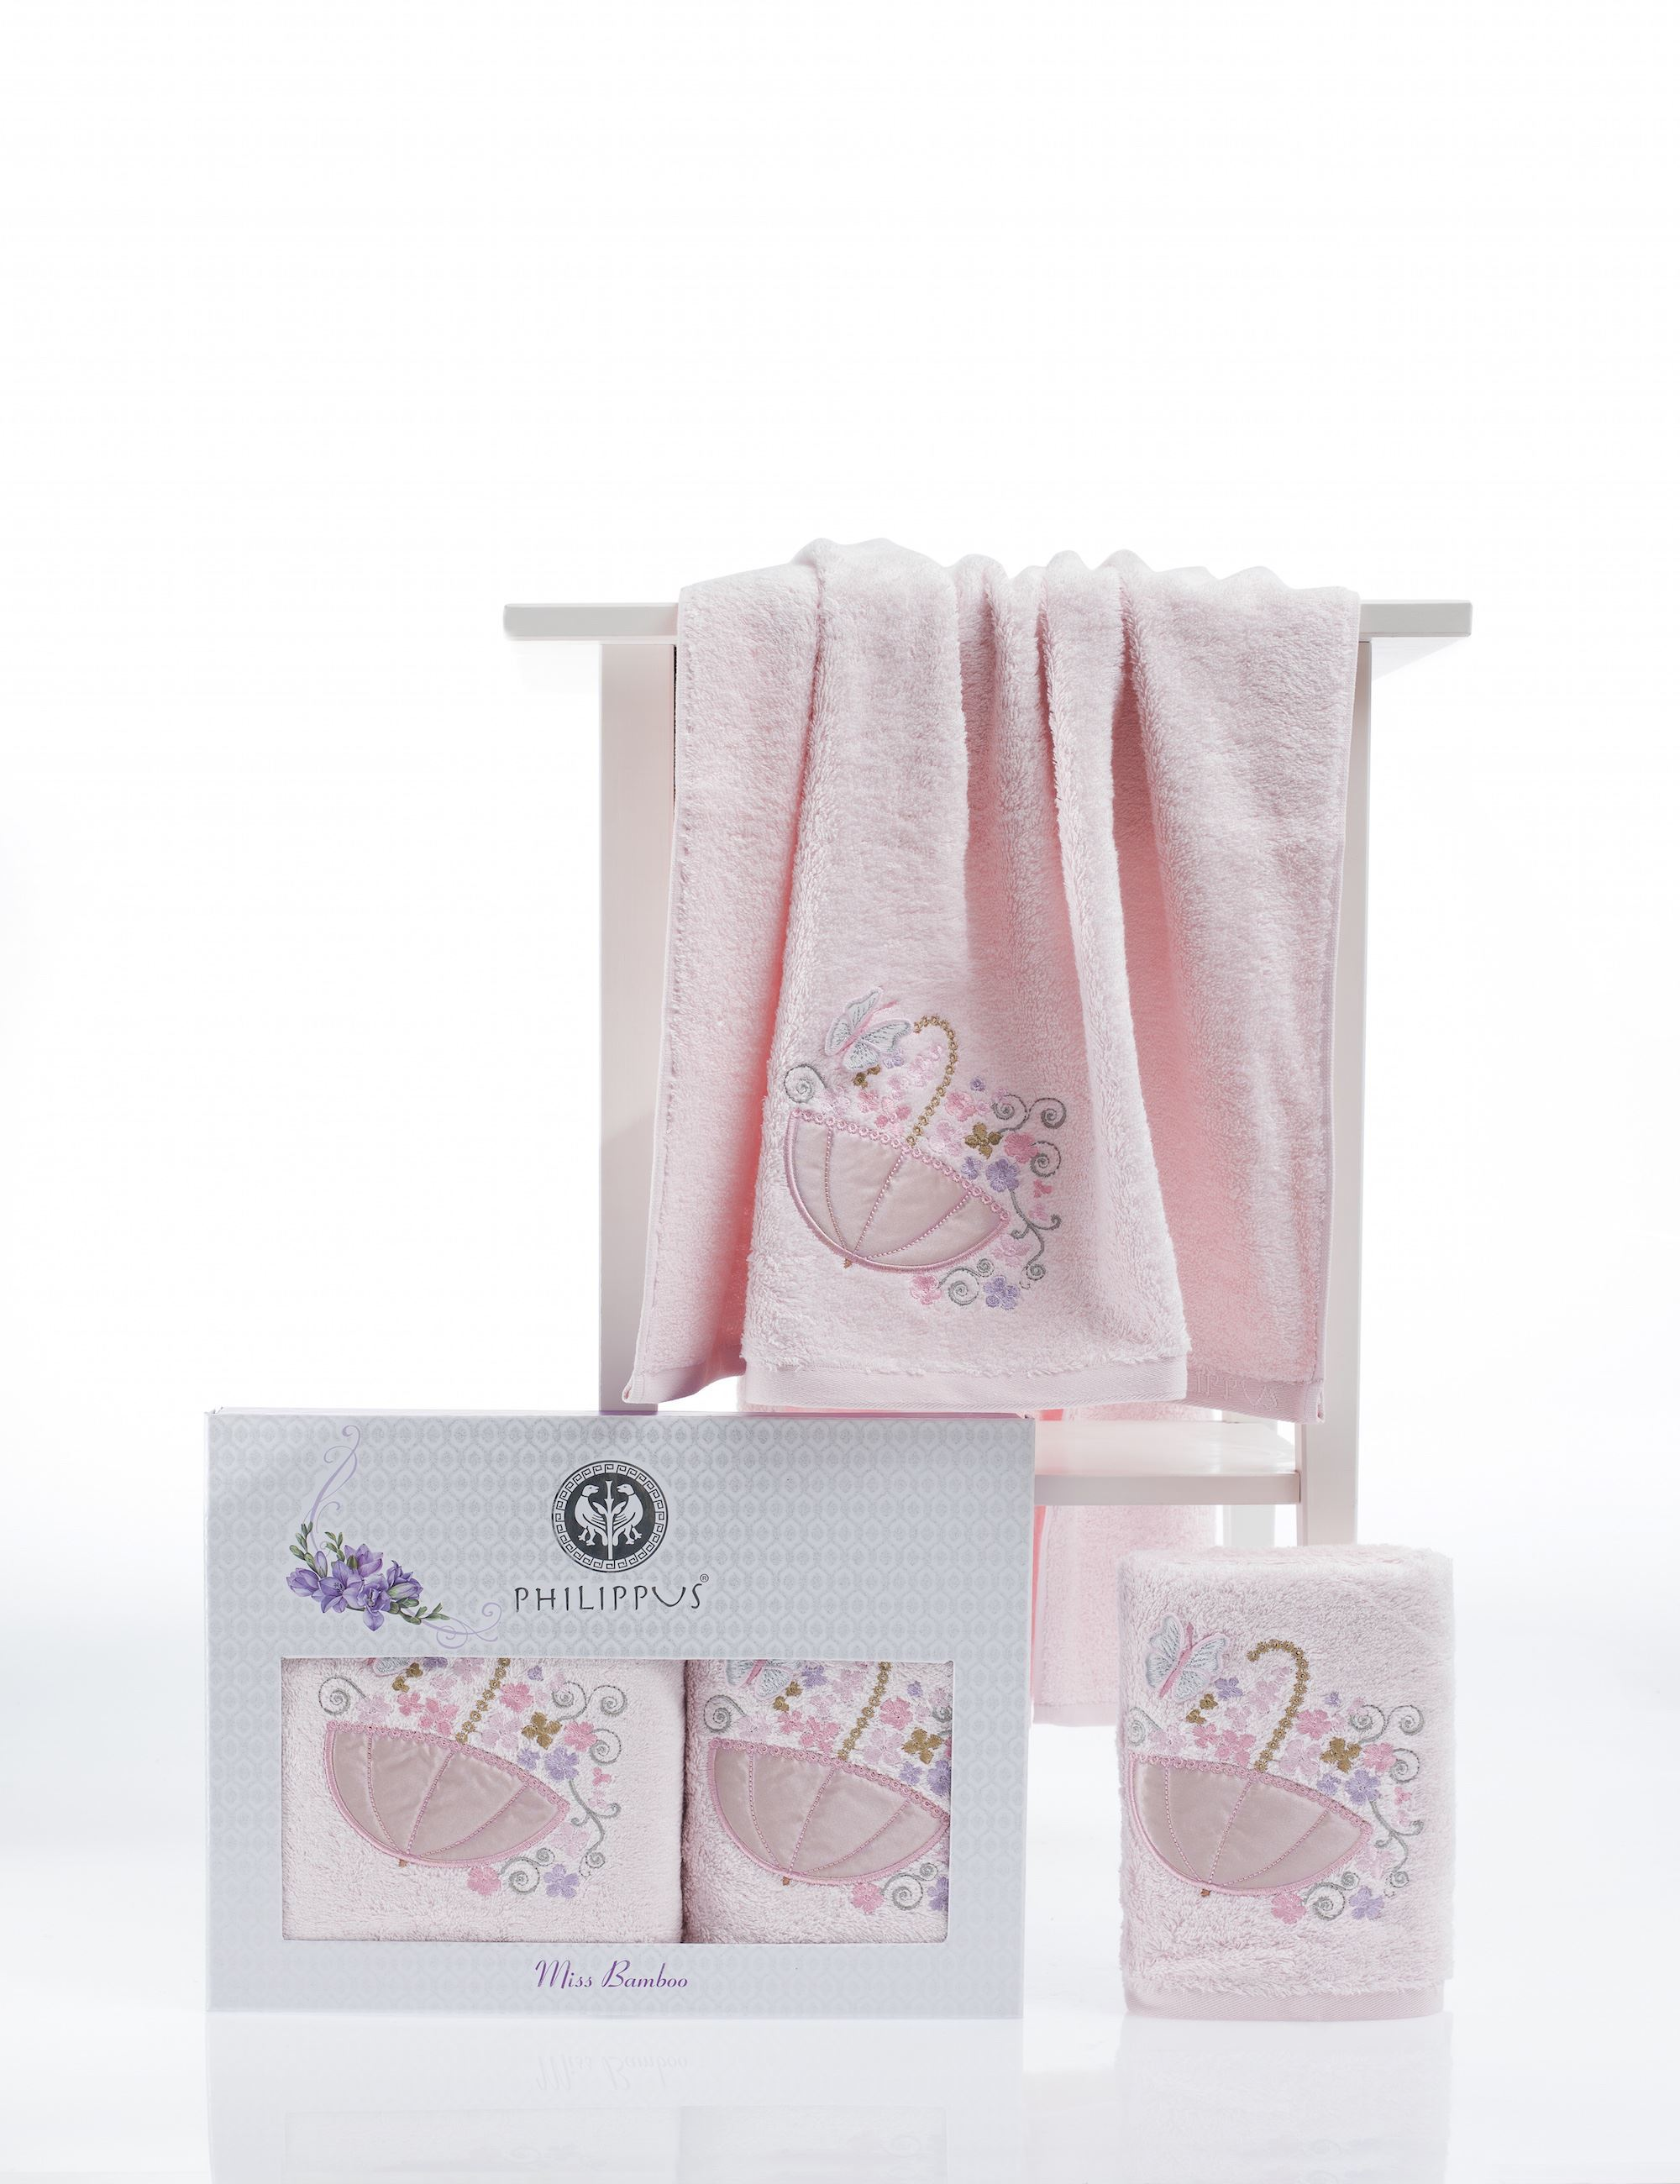 Полотенца Philippus Полотенце Victoria Цвет: Светло-Розовый (50х90 см,70х140 см) набор из 3 полотенец merzuka sakura 50х90 2 70х140 8432 оранжевый